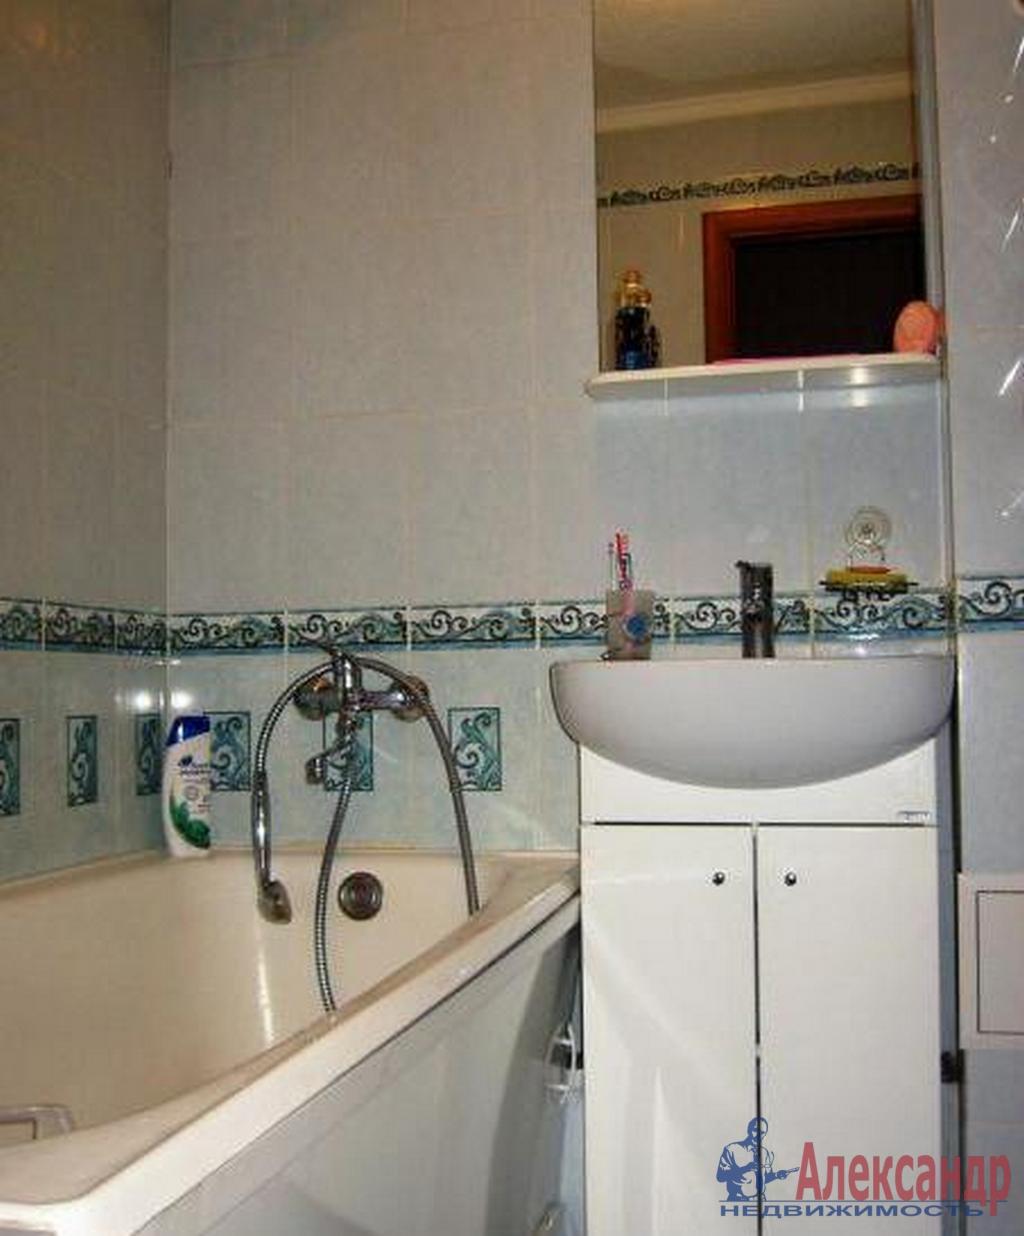 2-комнатная квартира (48м2) в аренду по адресу Наличная ул., 36— фото 4 из 4